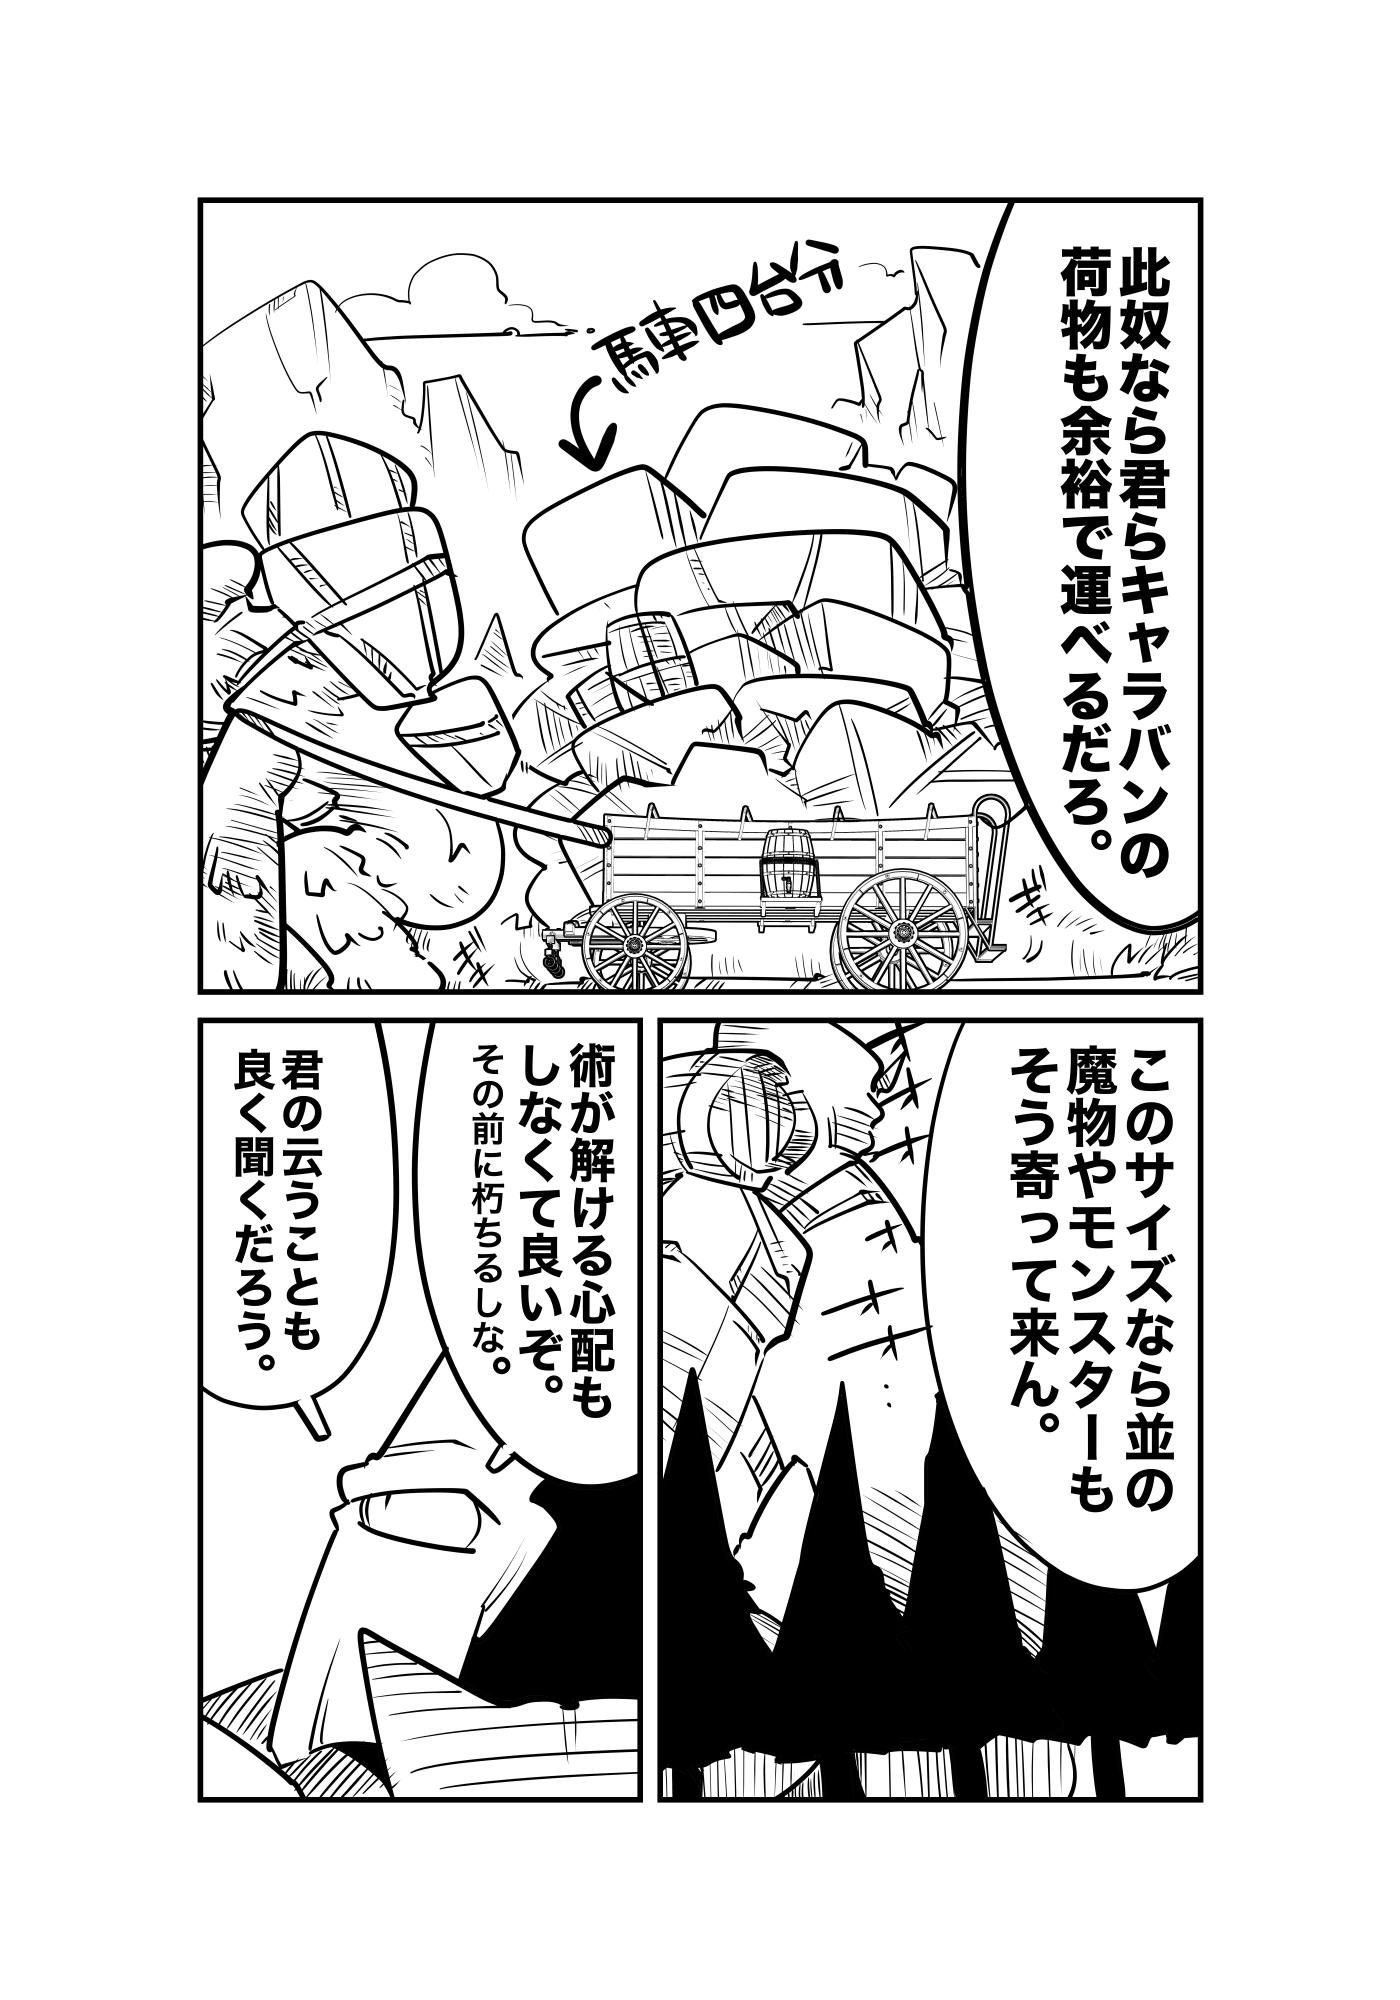 f:id:terashimaru117:20210914230006p:plain